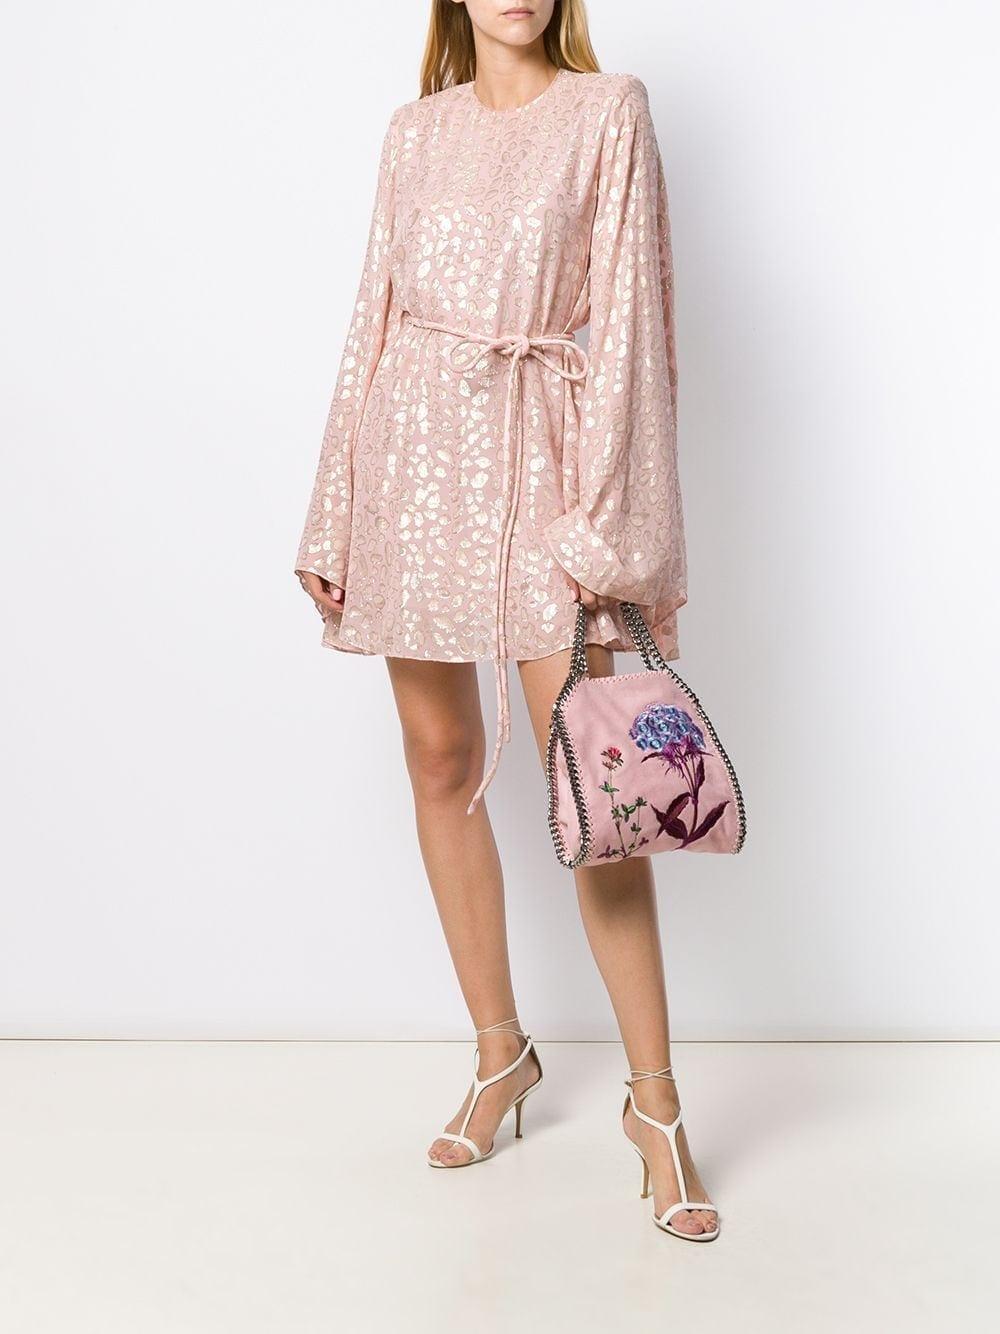 STELLA MCCARTNEY Animal Print Dress